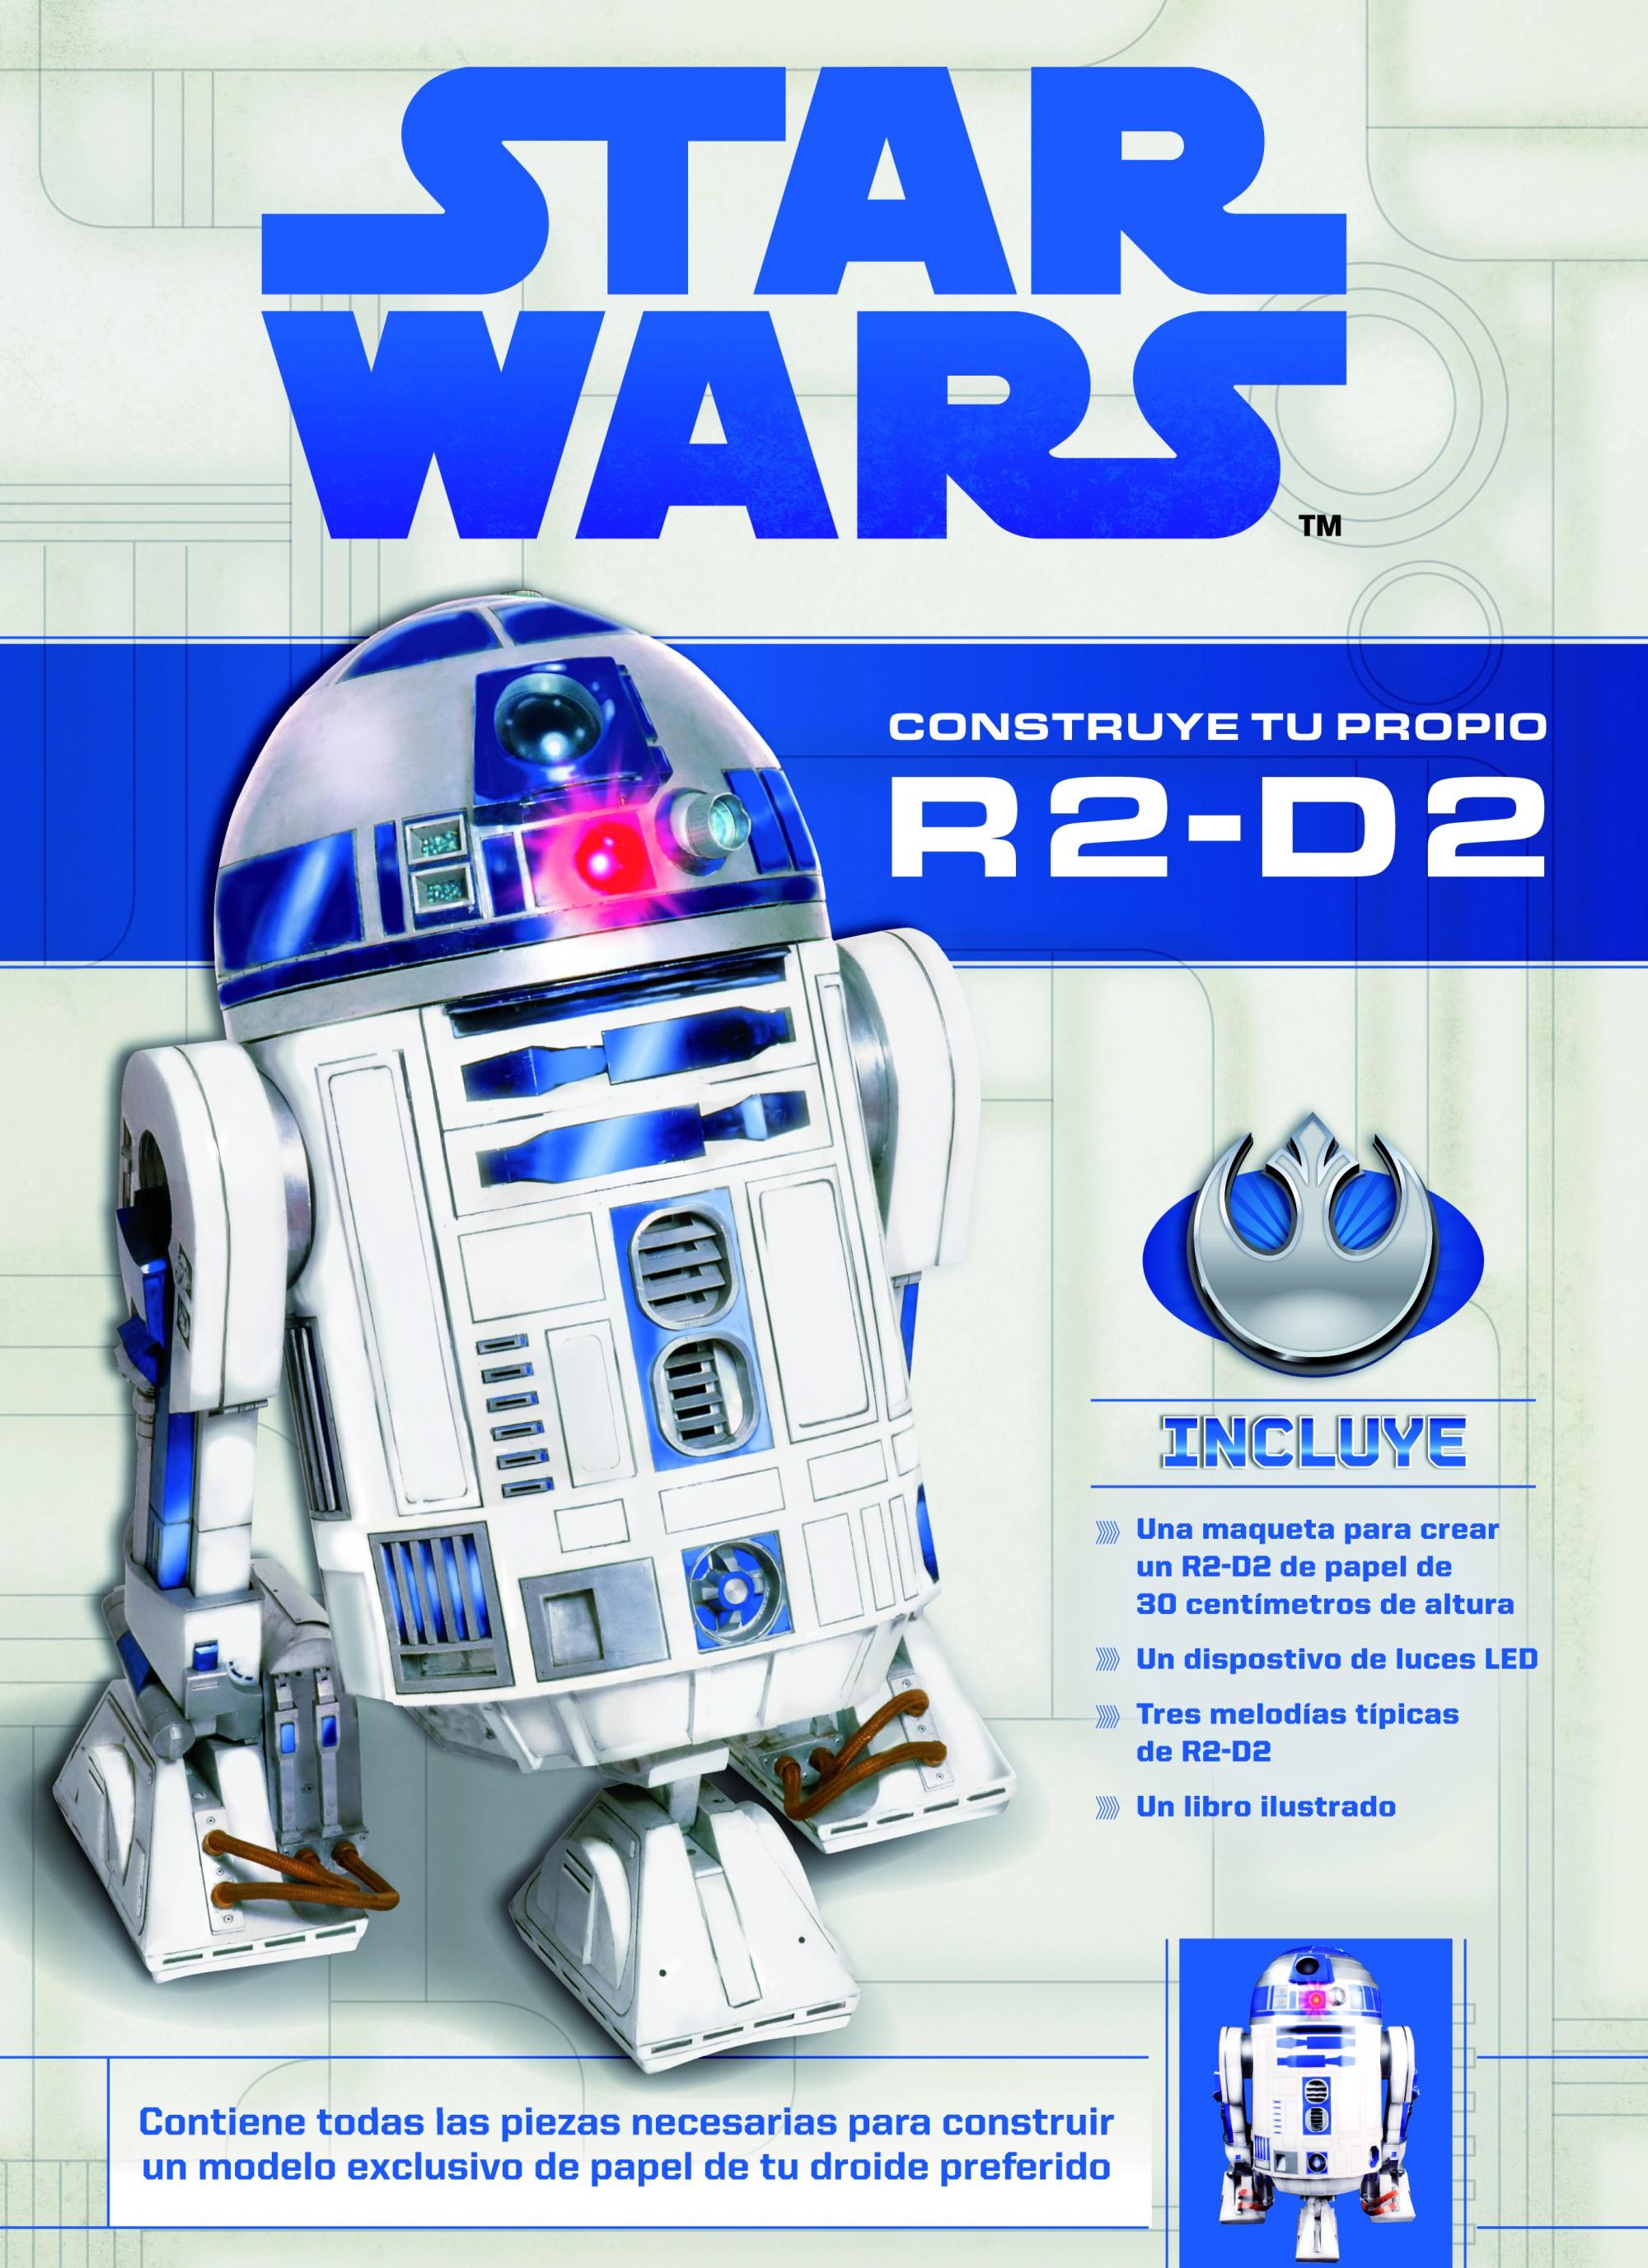 CONSTRUYE TU PROPIO R2-D2 Construye-tu-propio-r2-d2_9788448019181